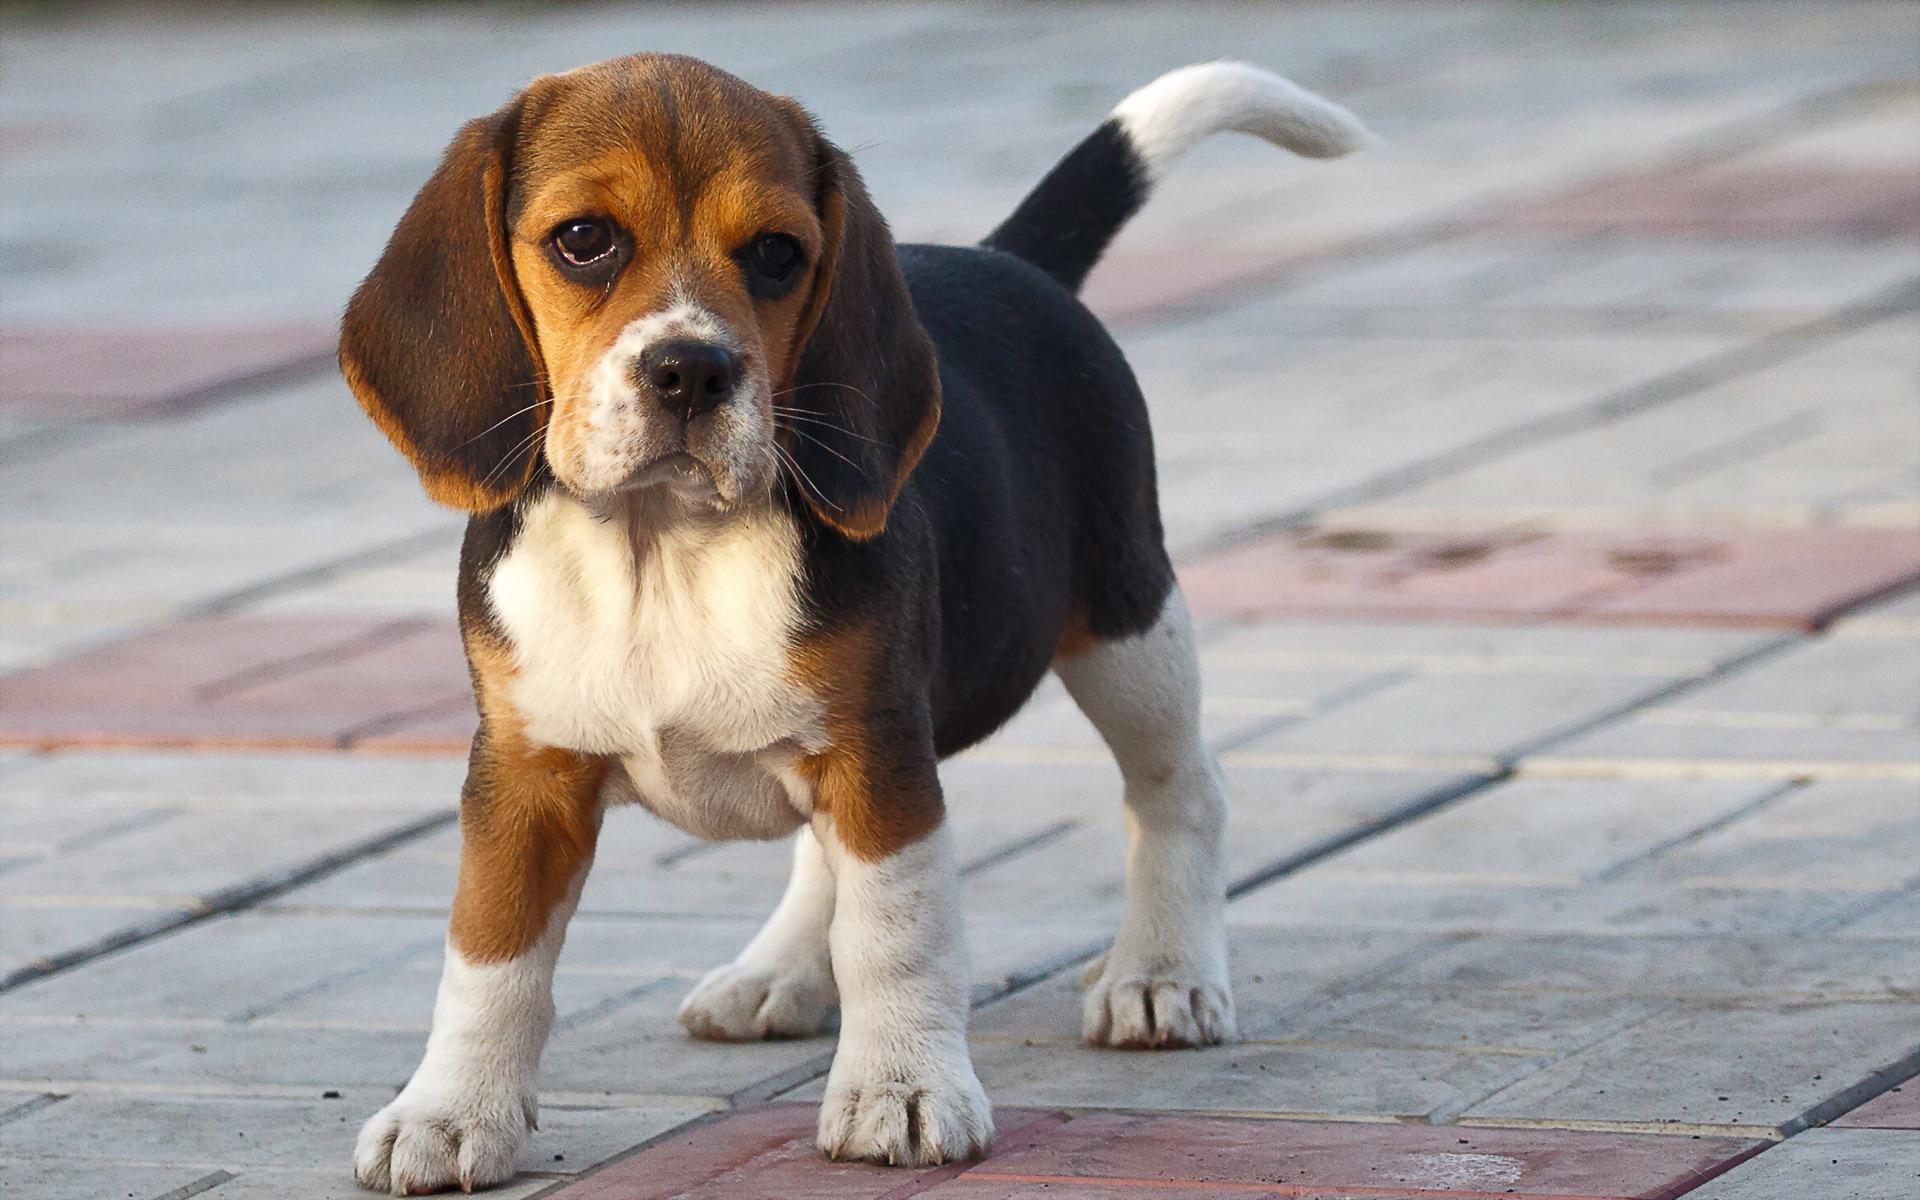 wallpaper wallpapers sidewalk beagle originals pictures puppy 1920x1200